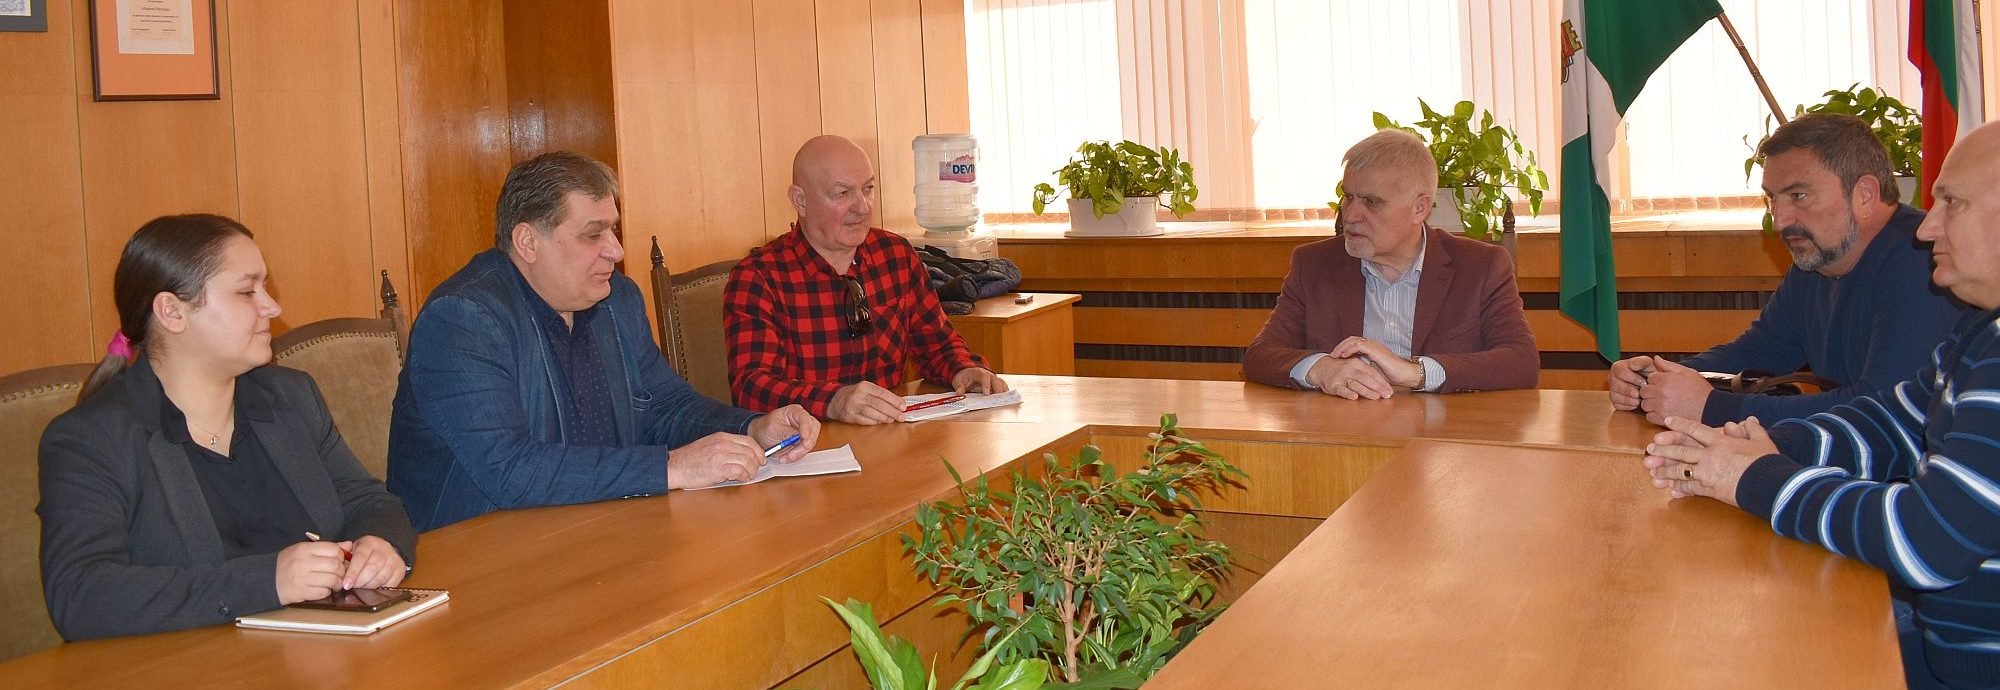 Кметът Денчо Бояджиев се срещна с Организационния ком� ...